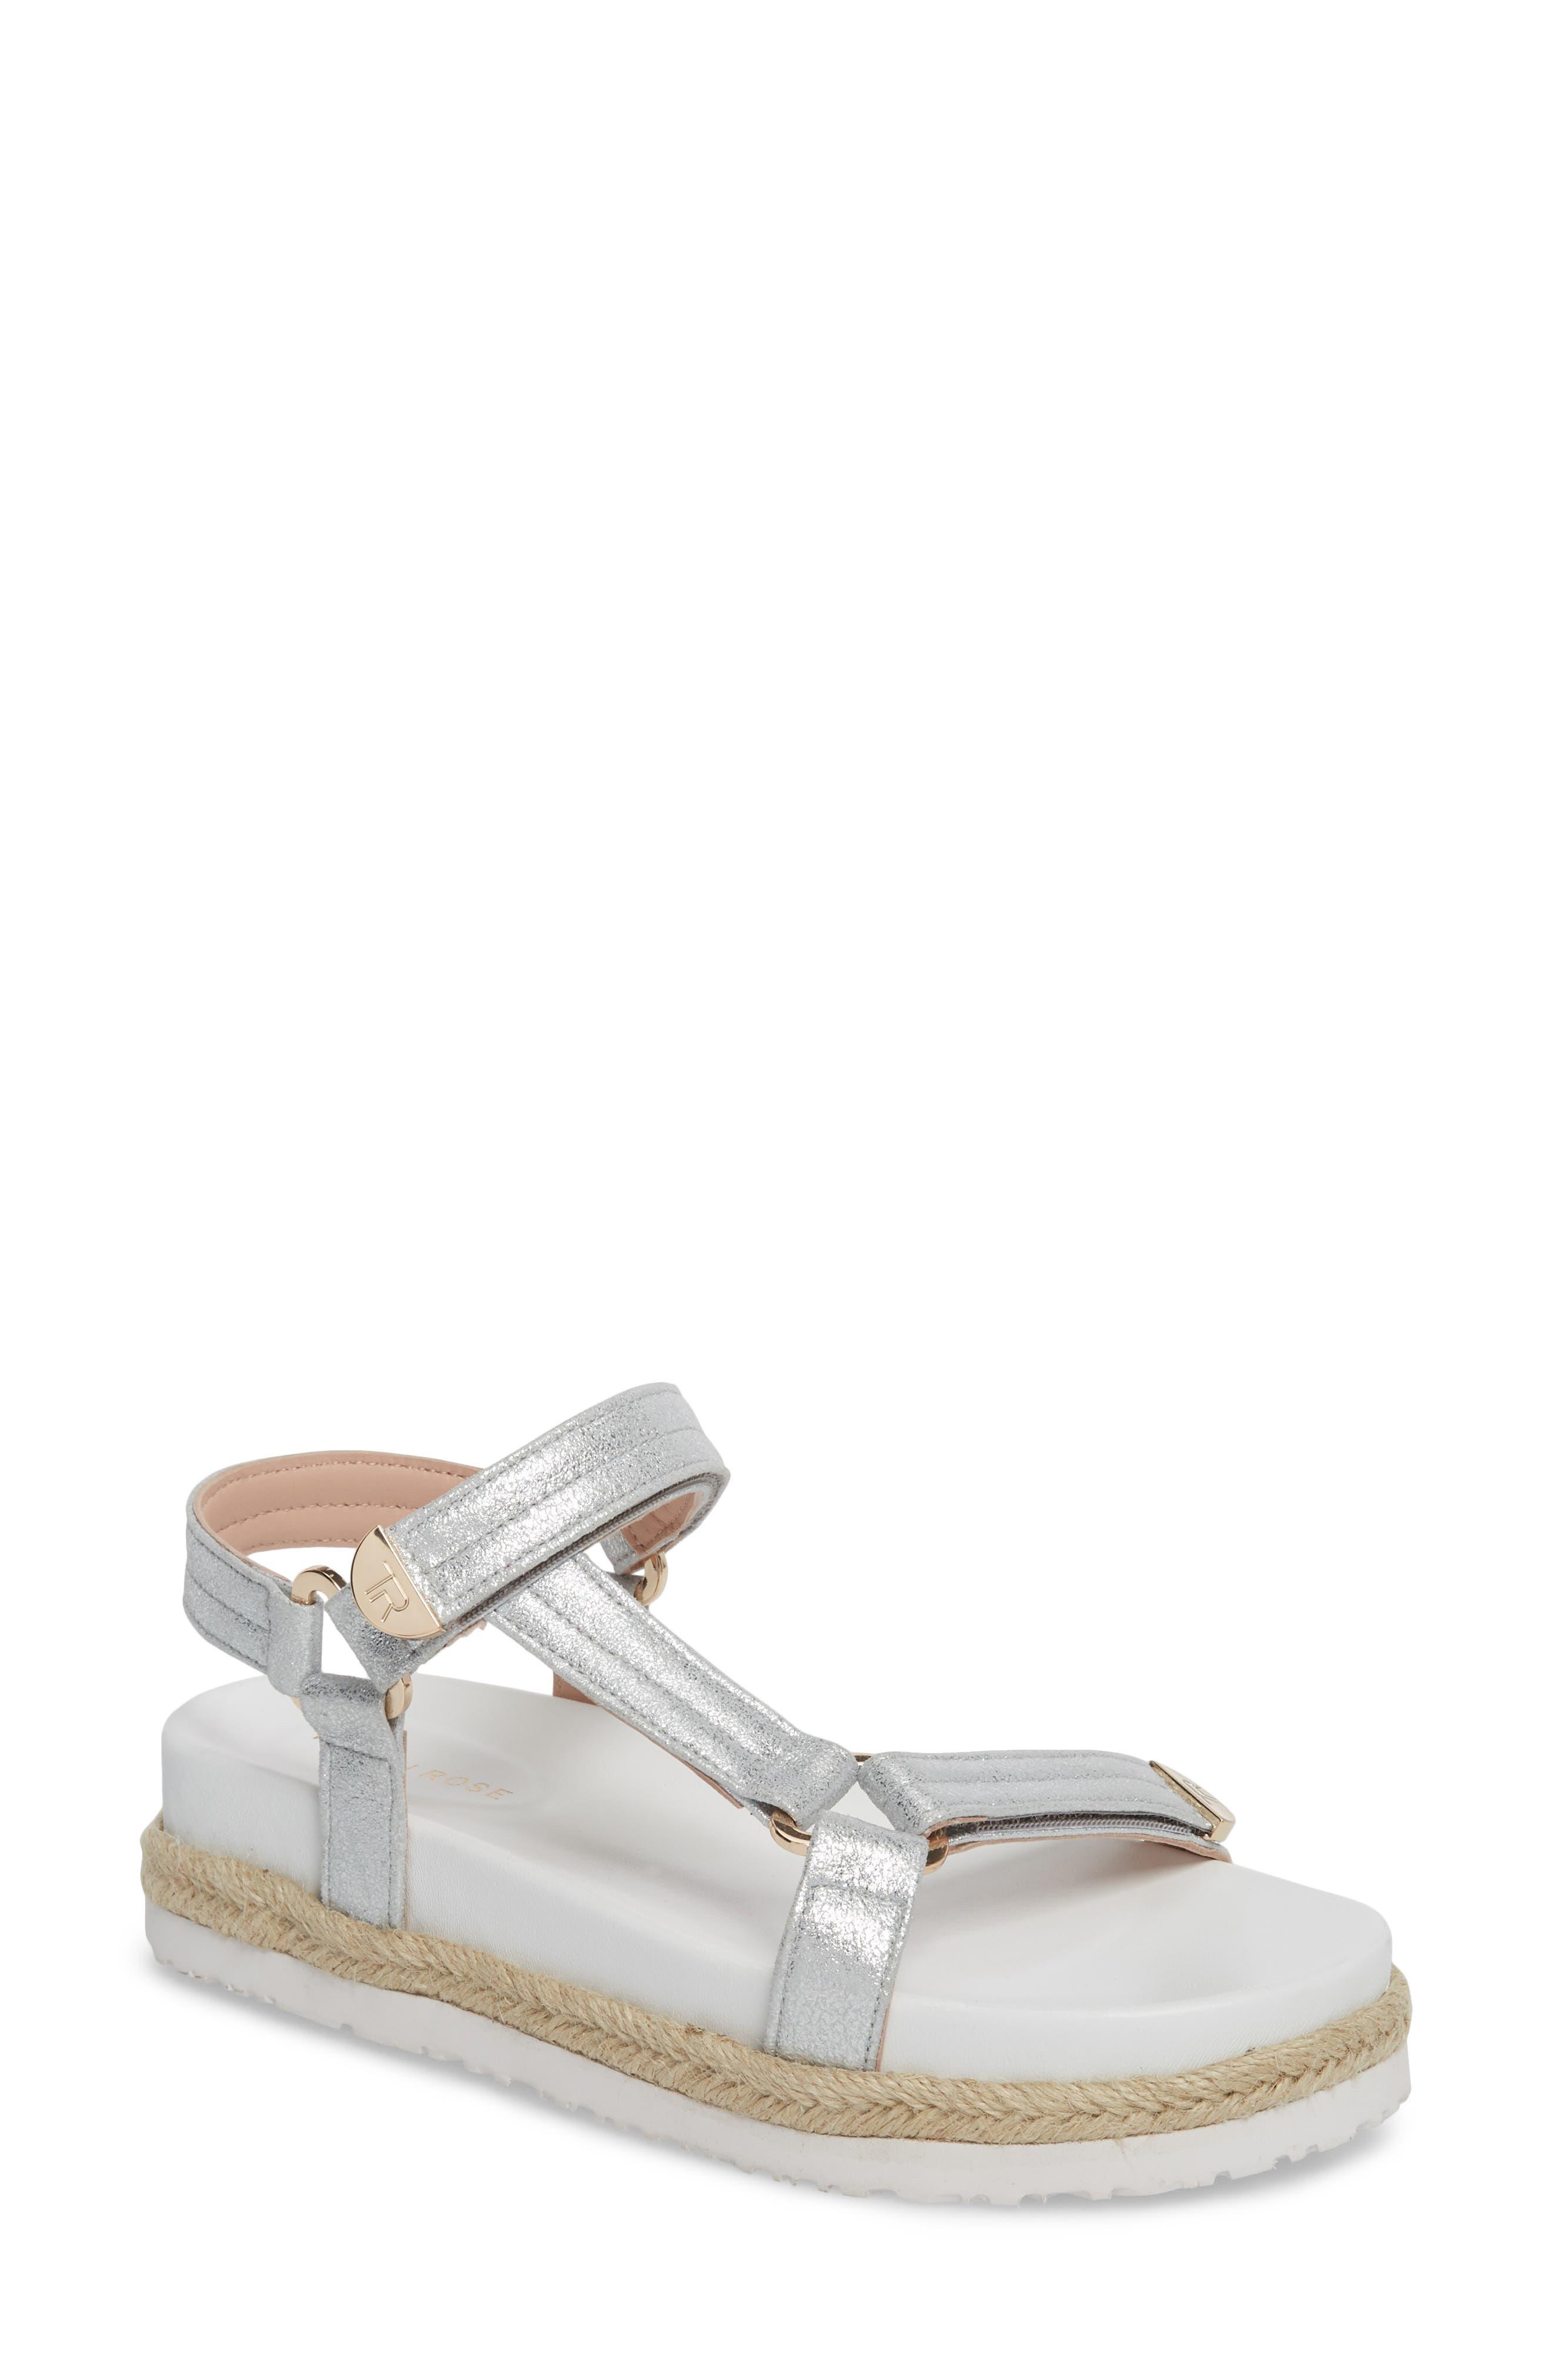 Lydia Platform Sport Sandal,                         Main,                         color, Silver Leather